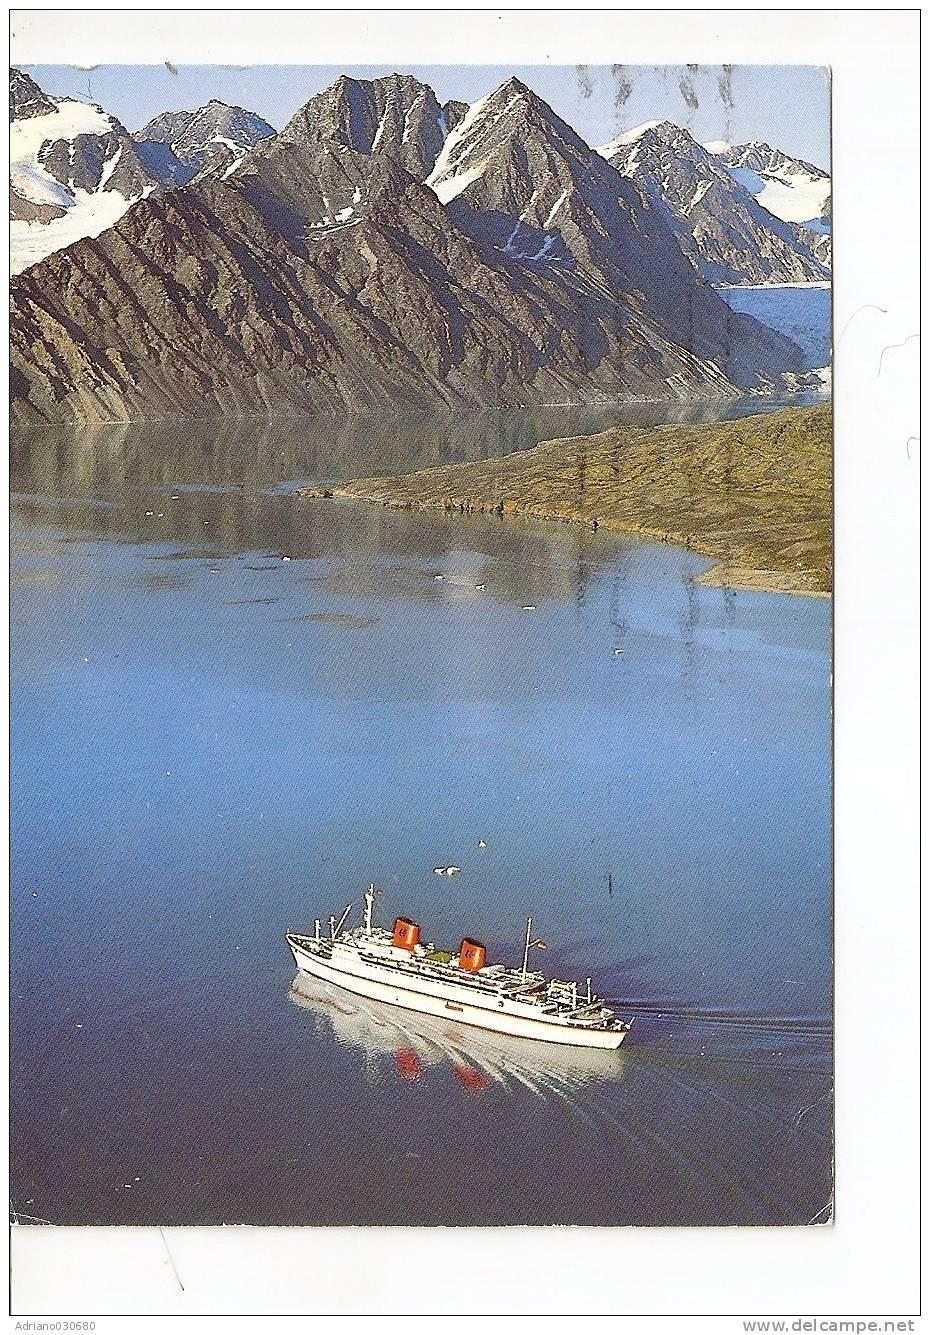 GROSSA NAVE DA CROCIERA SVALBARD TURISTBAT I KROSSFJORDEN NORWAY TOURIST VESSEL IN THE KROSS FIORD - Dampfer